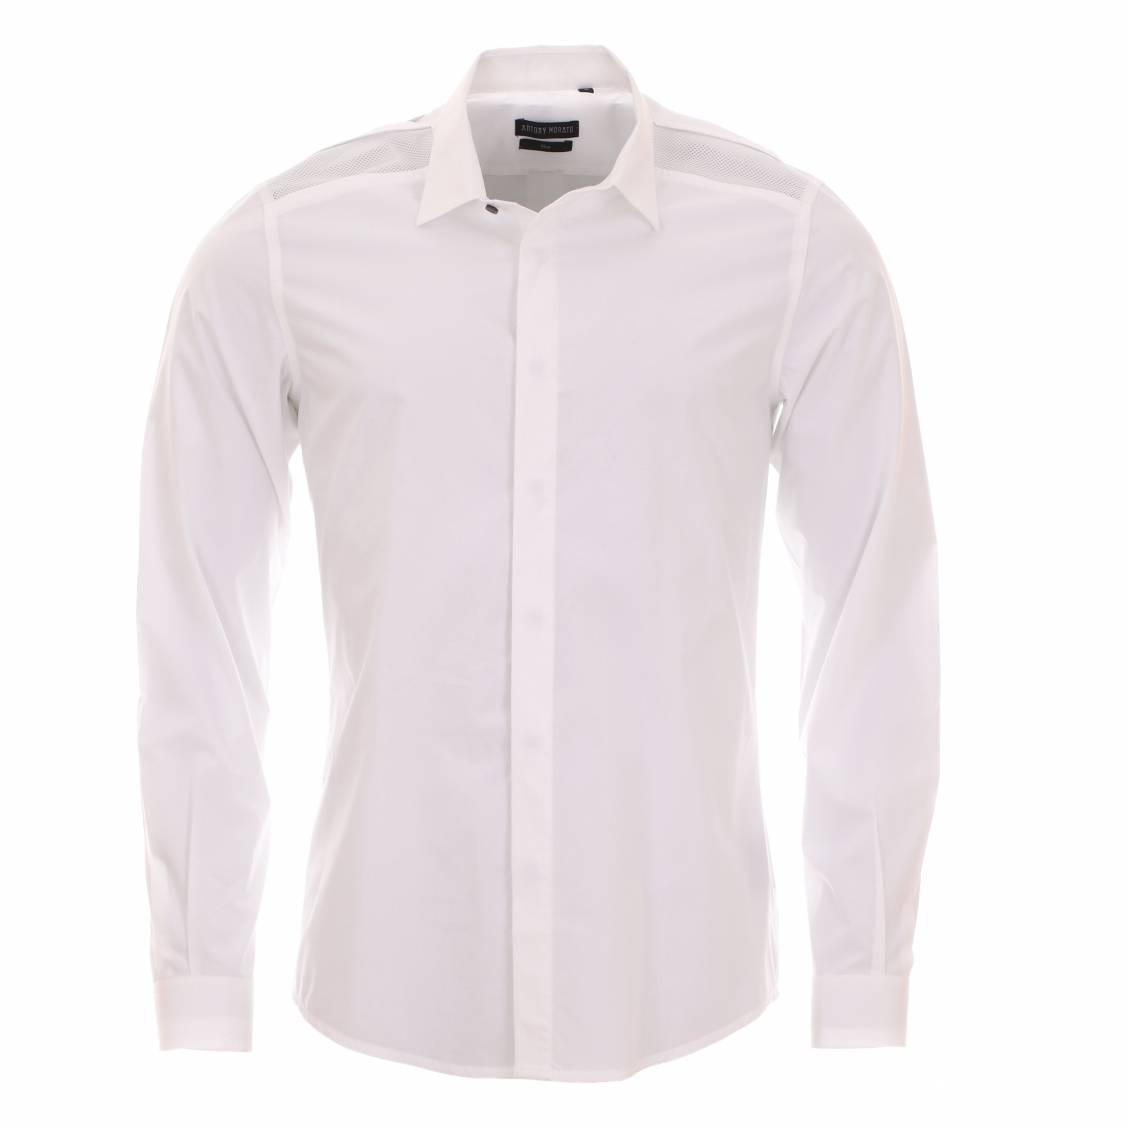 chemise homme cintr e antony morato blanche r sille aux. Black Bedroom Furniture Sets. Home Design Ideas